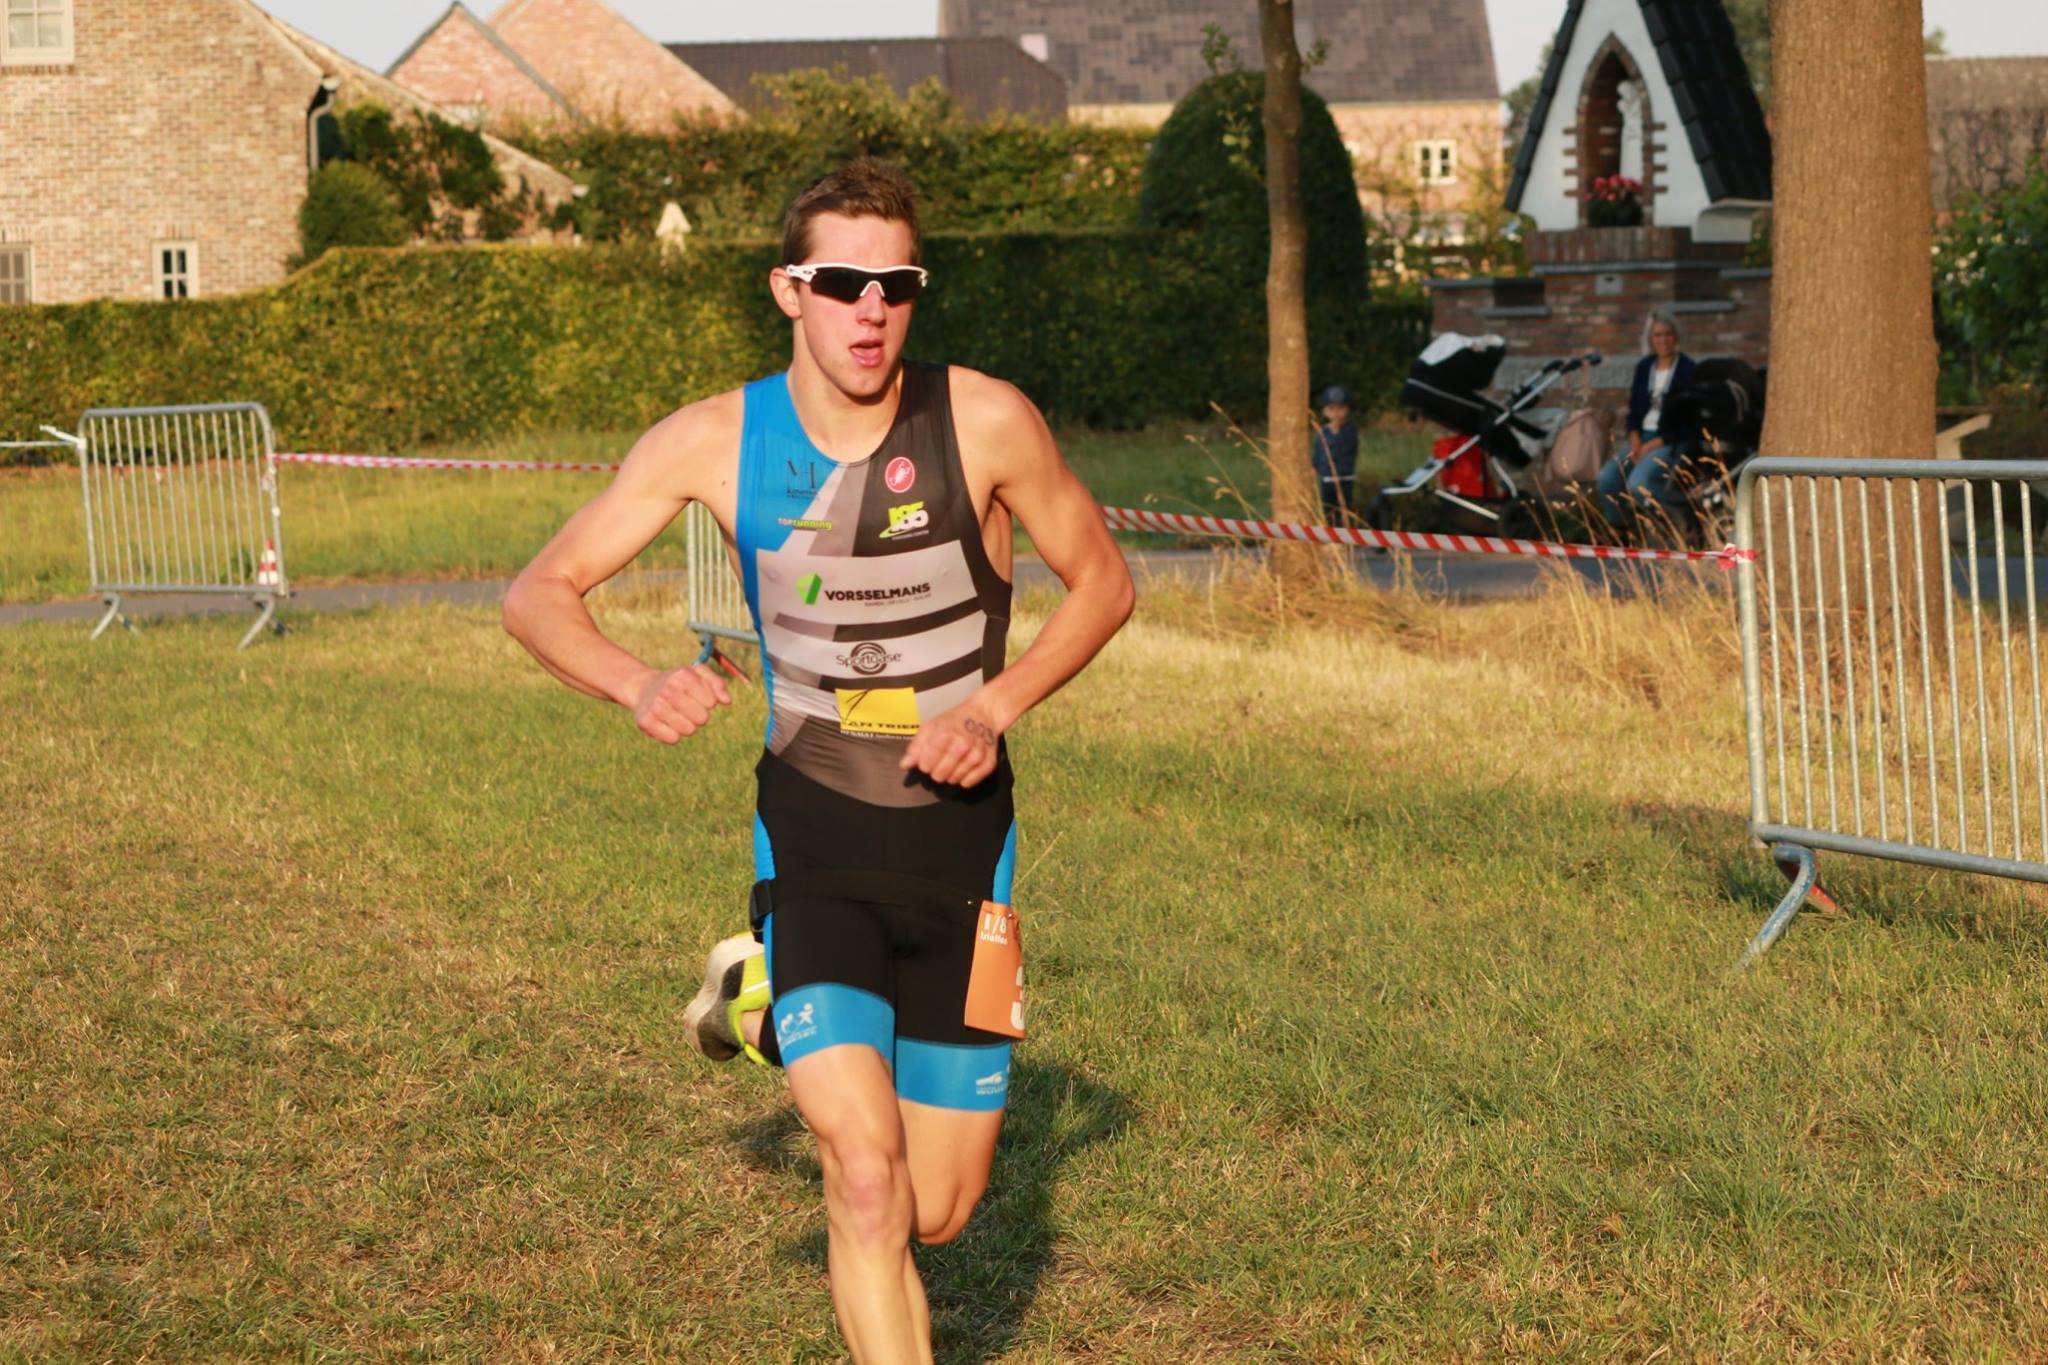 Jens Van Looveren wint de Sterke Peer (foto: Chris Hofkens)